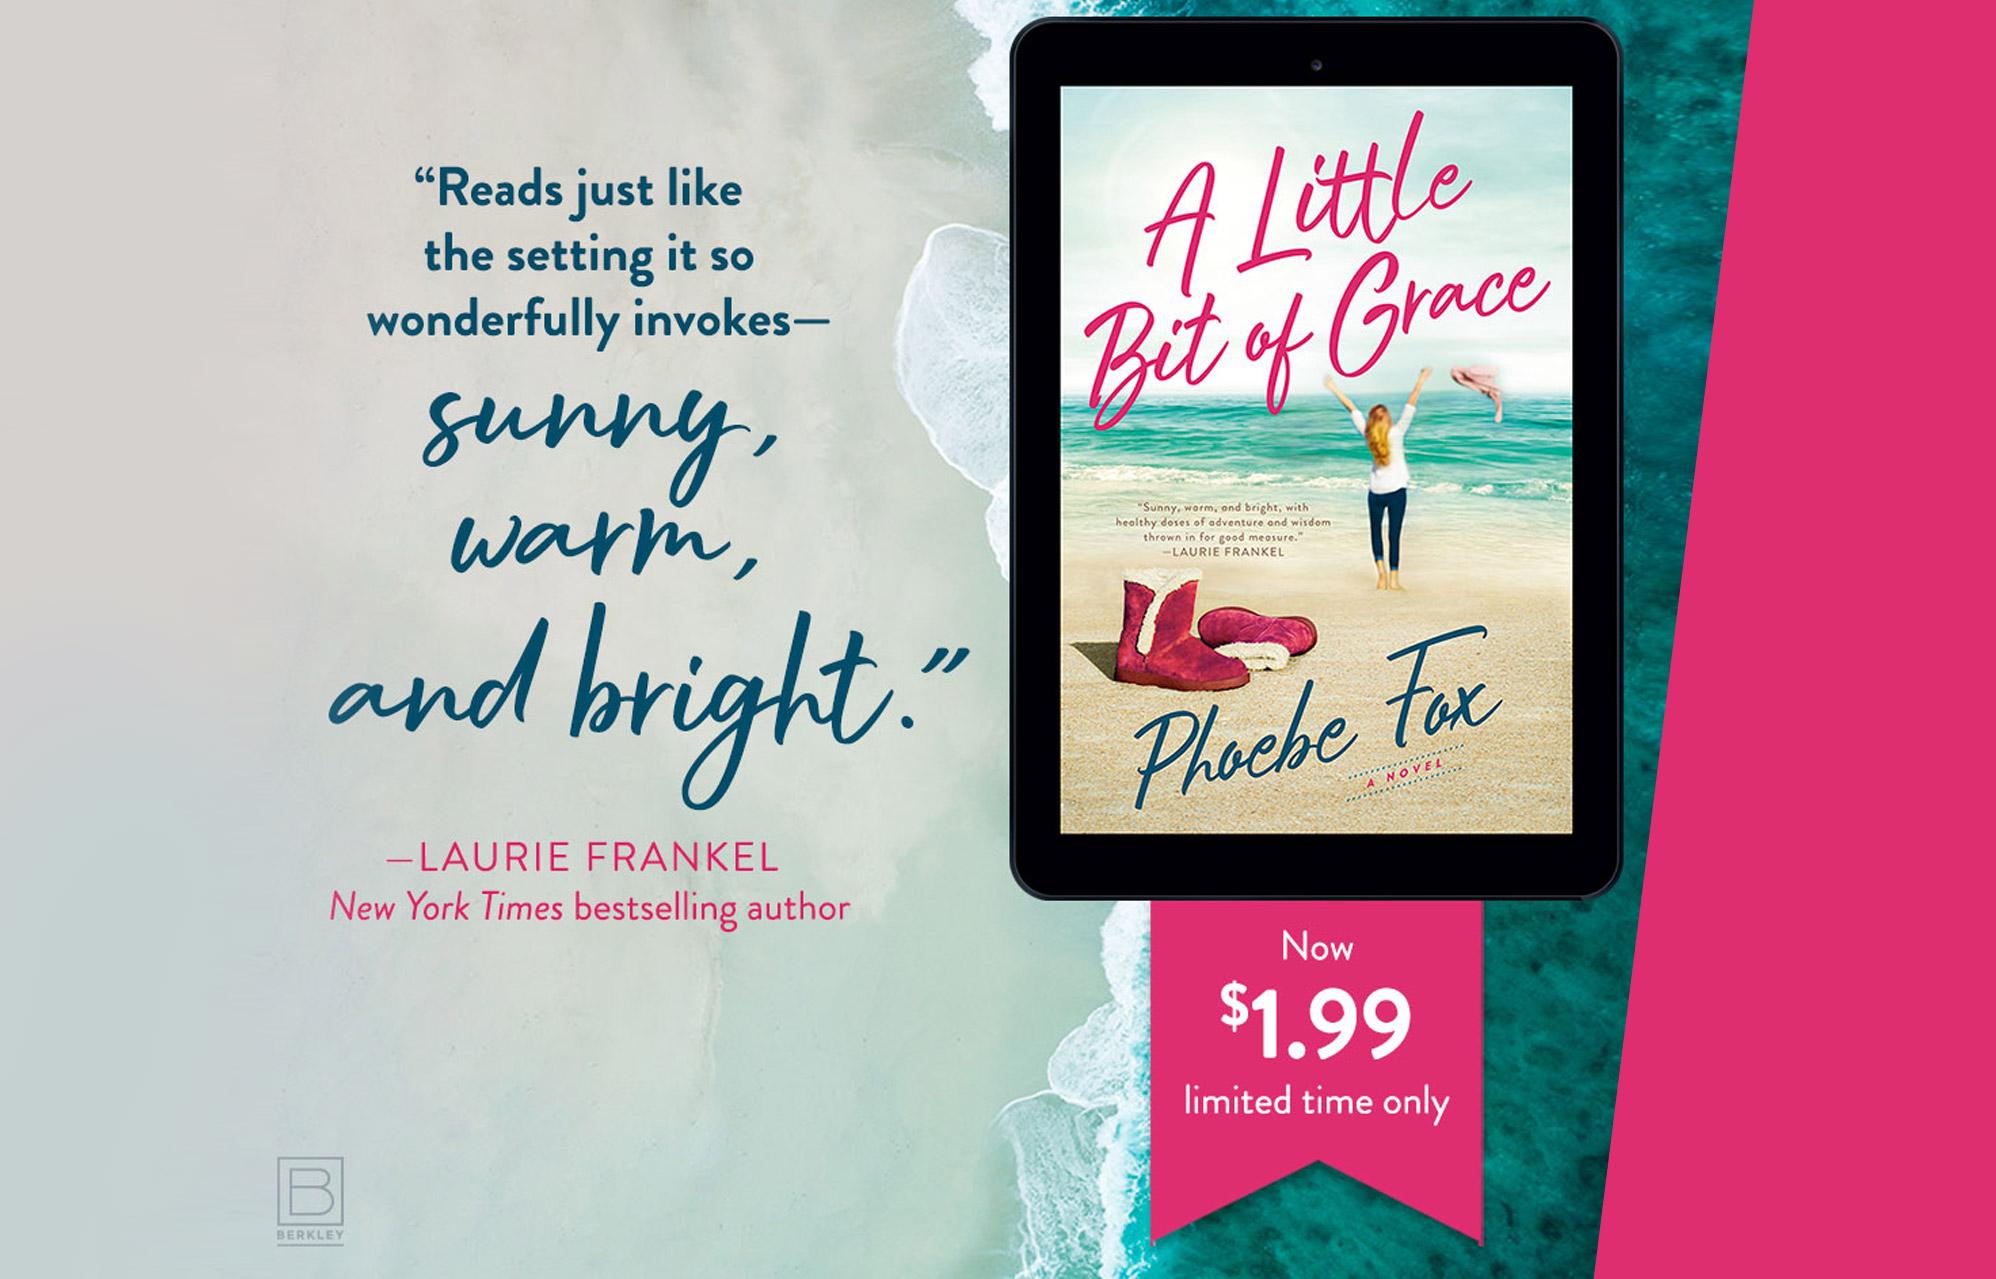 A Little Bit Of Grace, a Novel By Phoebe Fox